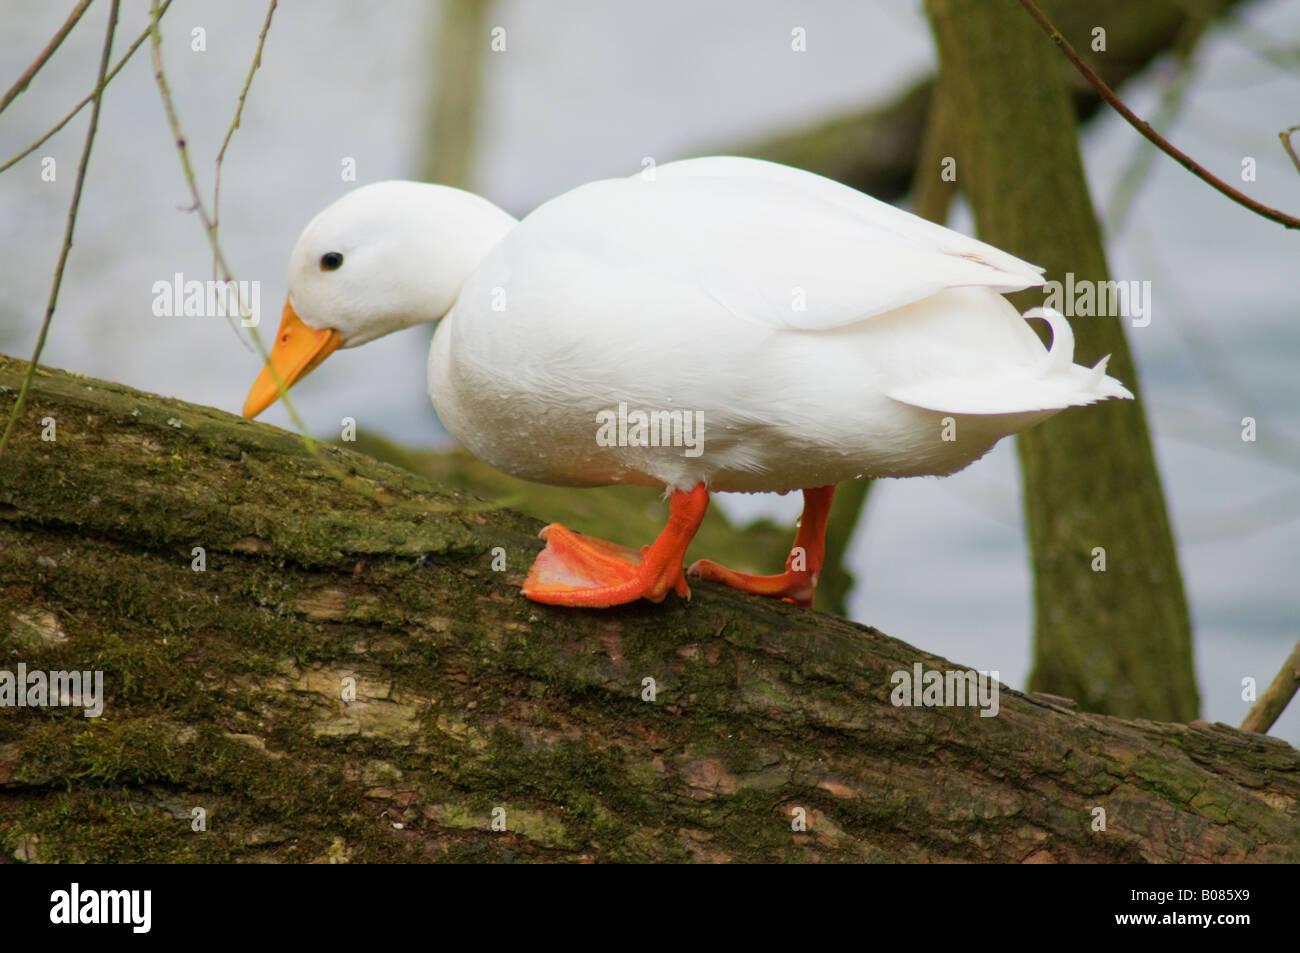 White duck (4) climbing a tree - Stock Image